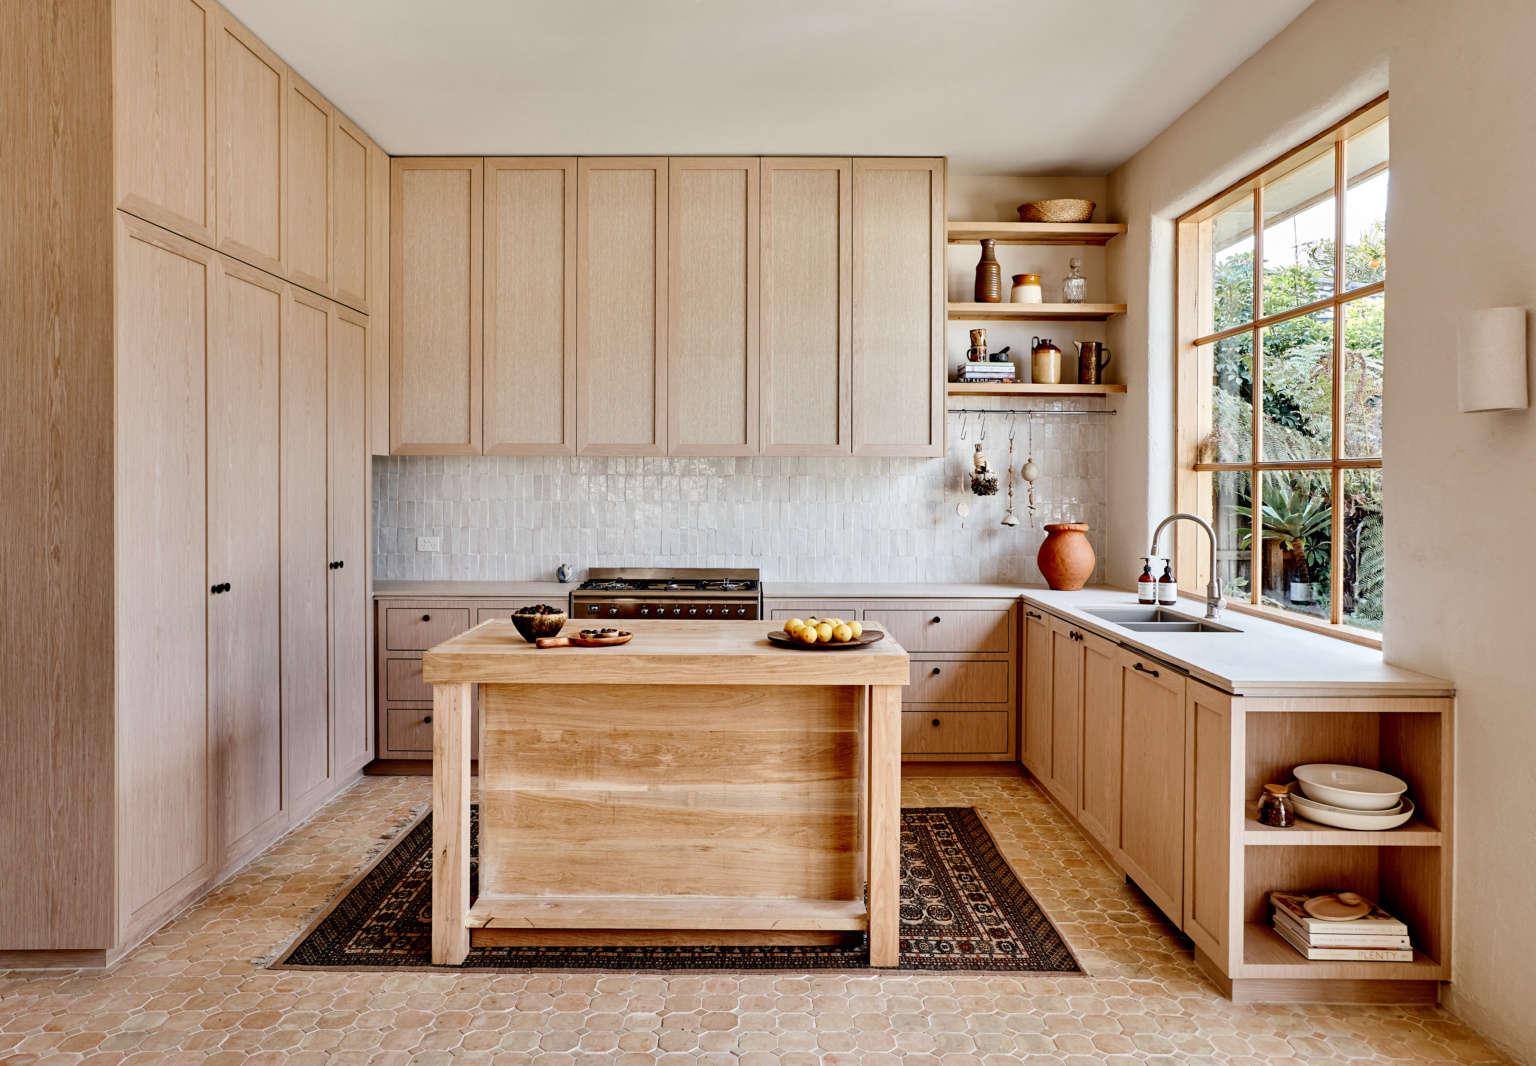 studio ezra wood kitchen melbourne amelia stanwix photo 1